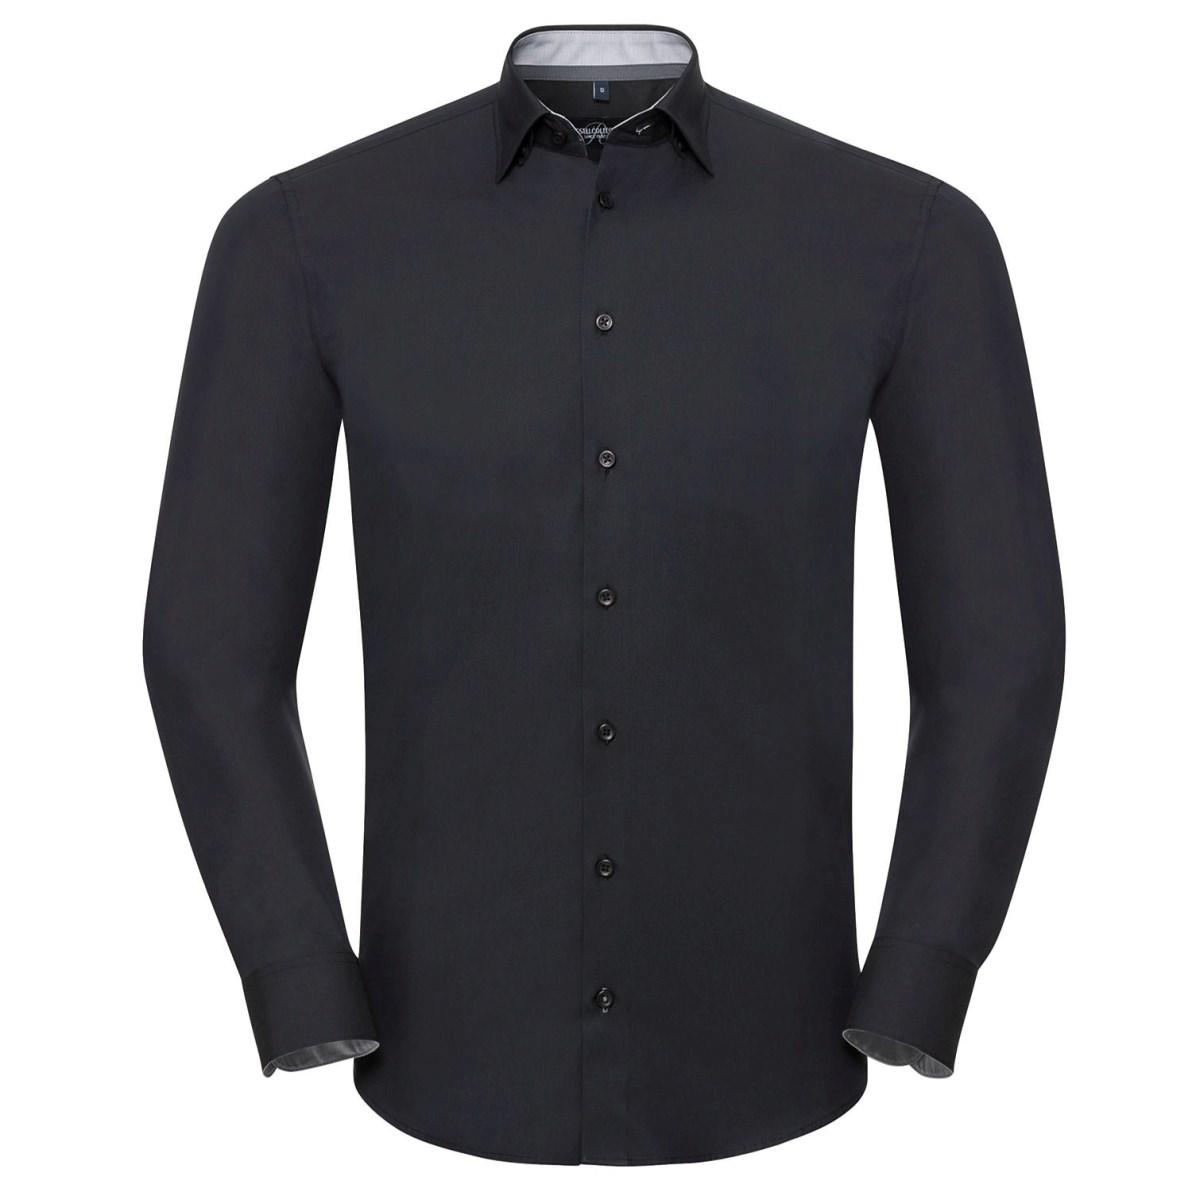 Tailliertes Ultimate Stretch Kontrast-Hemd - Langarm